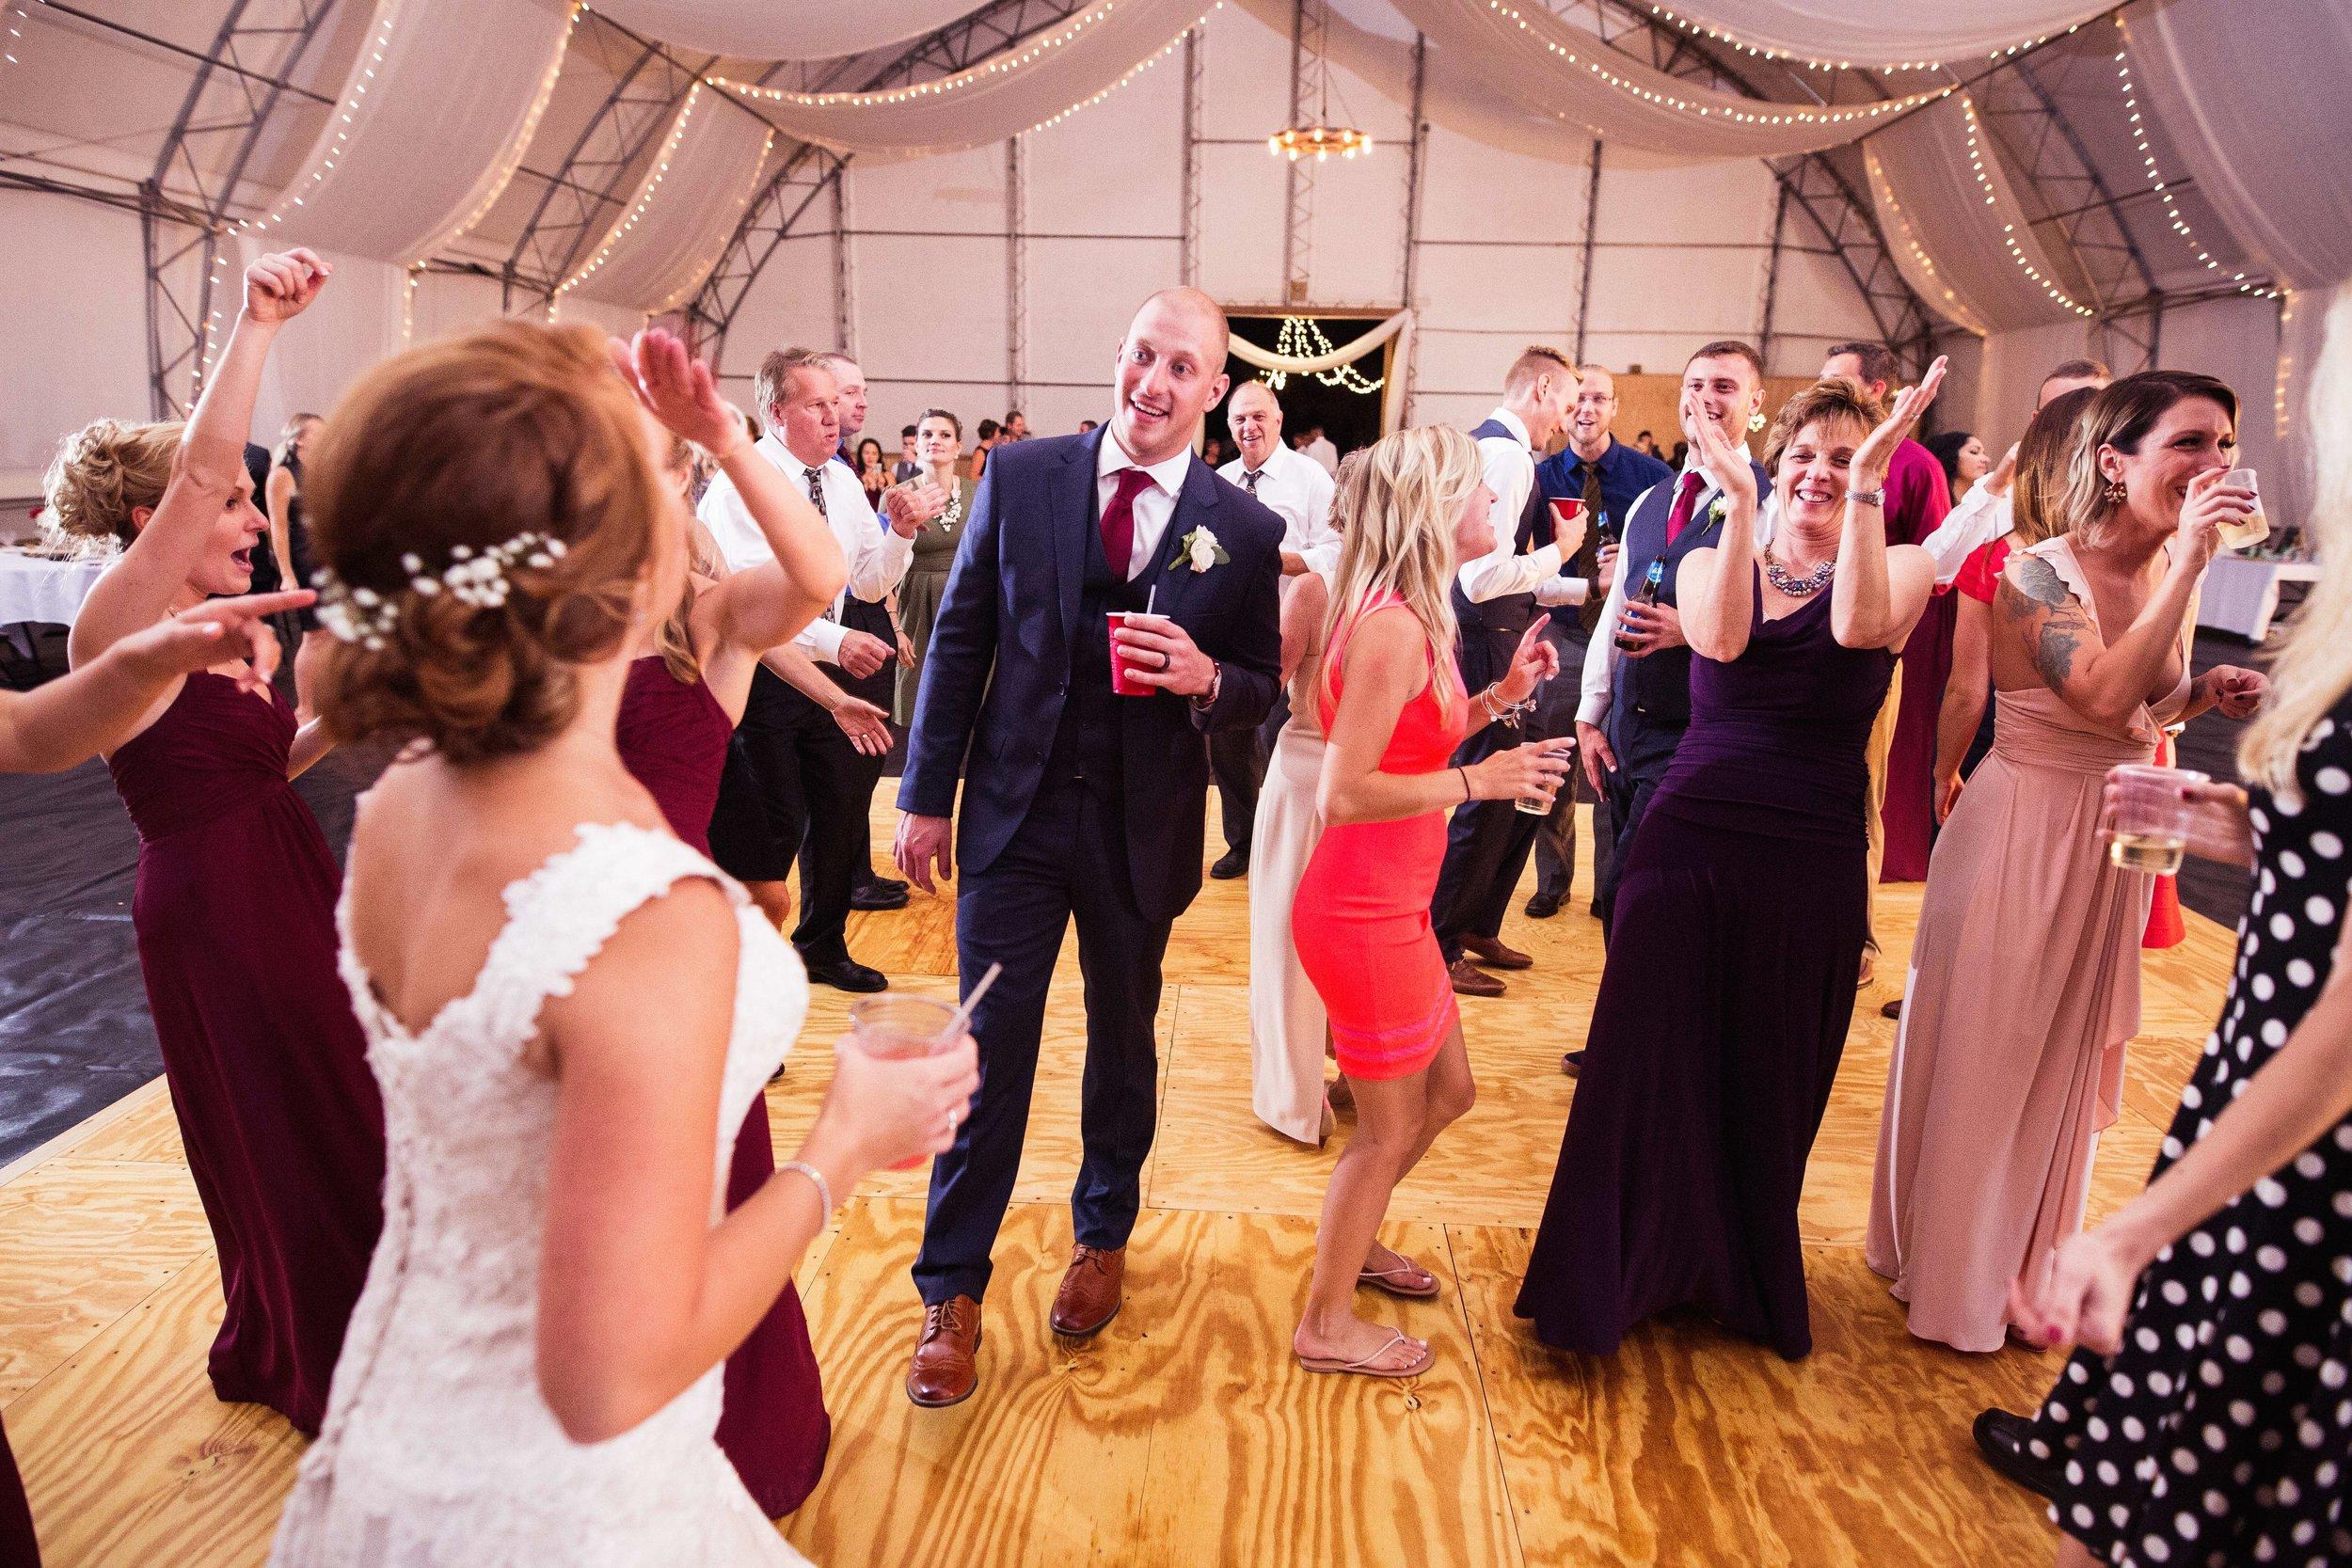 Blog-Lisa-James-Wedding-at Rosebud Estate Weddings in Arcade NY by Stefan-Ludwig-Photography-Buffalo-NY-75-x.jpg